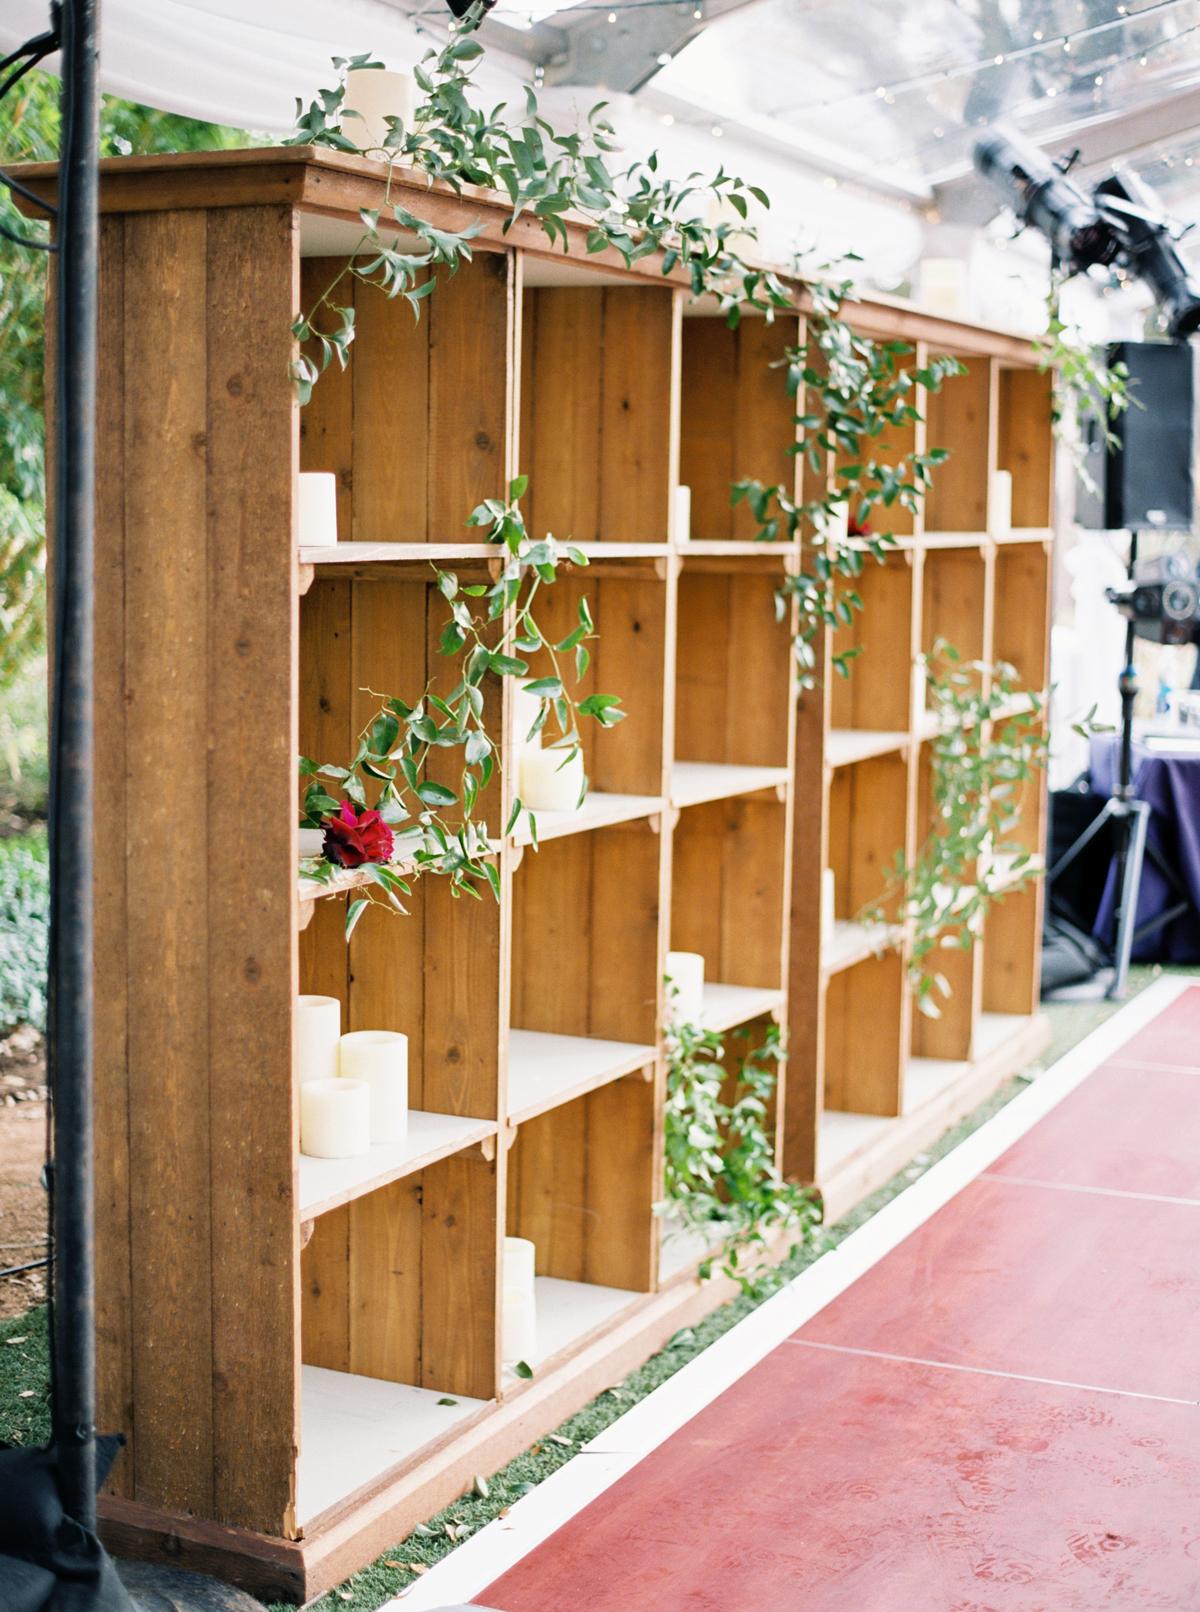 greenery garland and single rose adhered to shelves